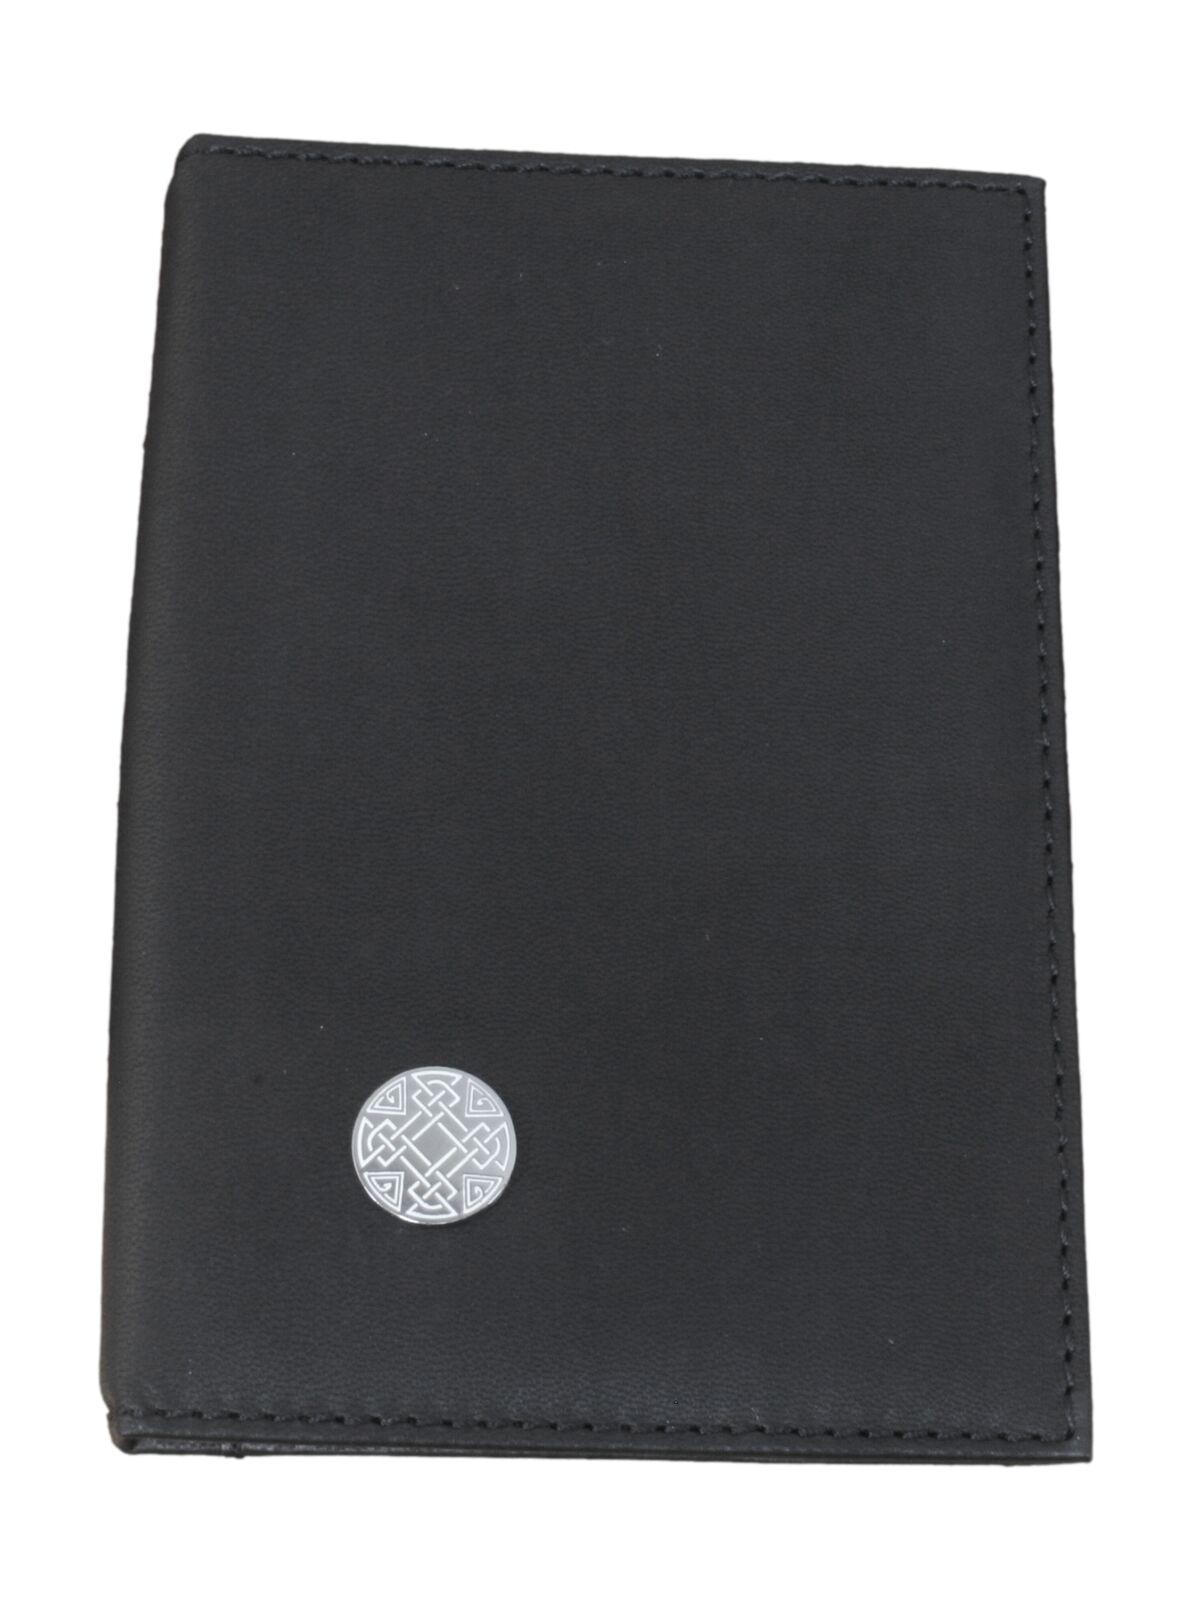 Celtic Knot Black Leather Shotgun/Firearms Certificate Holder 68